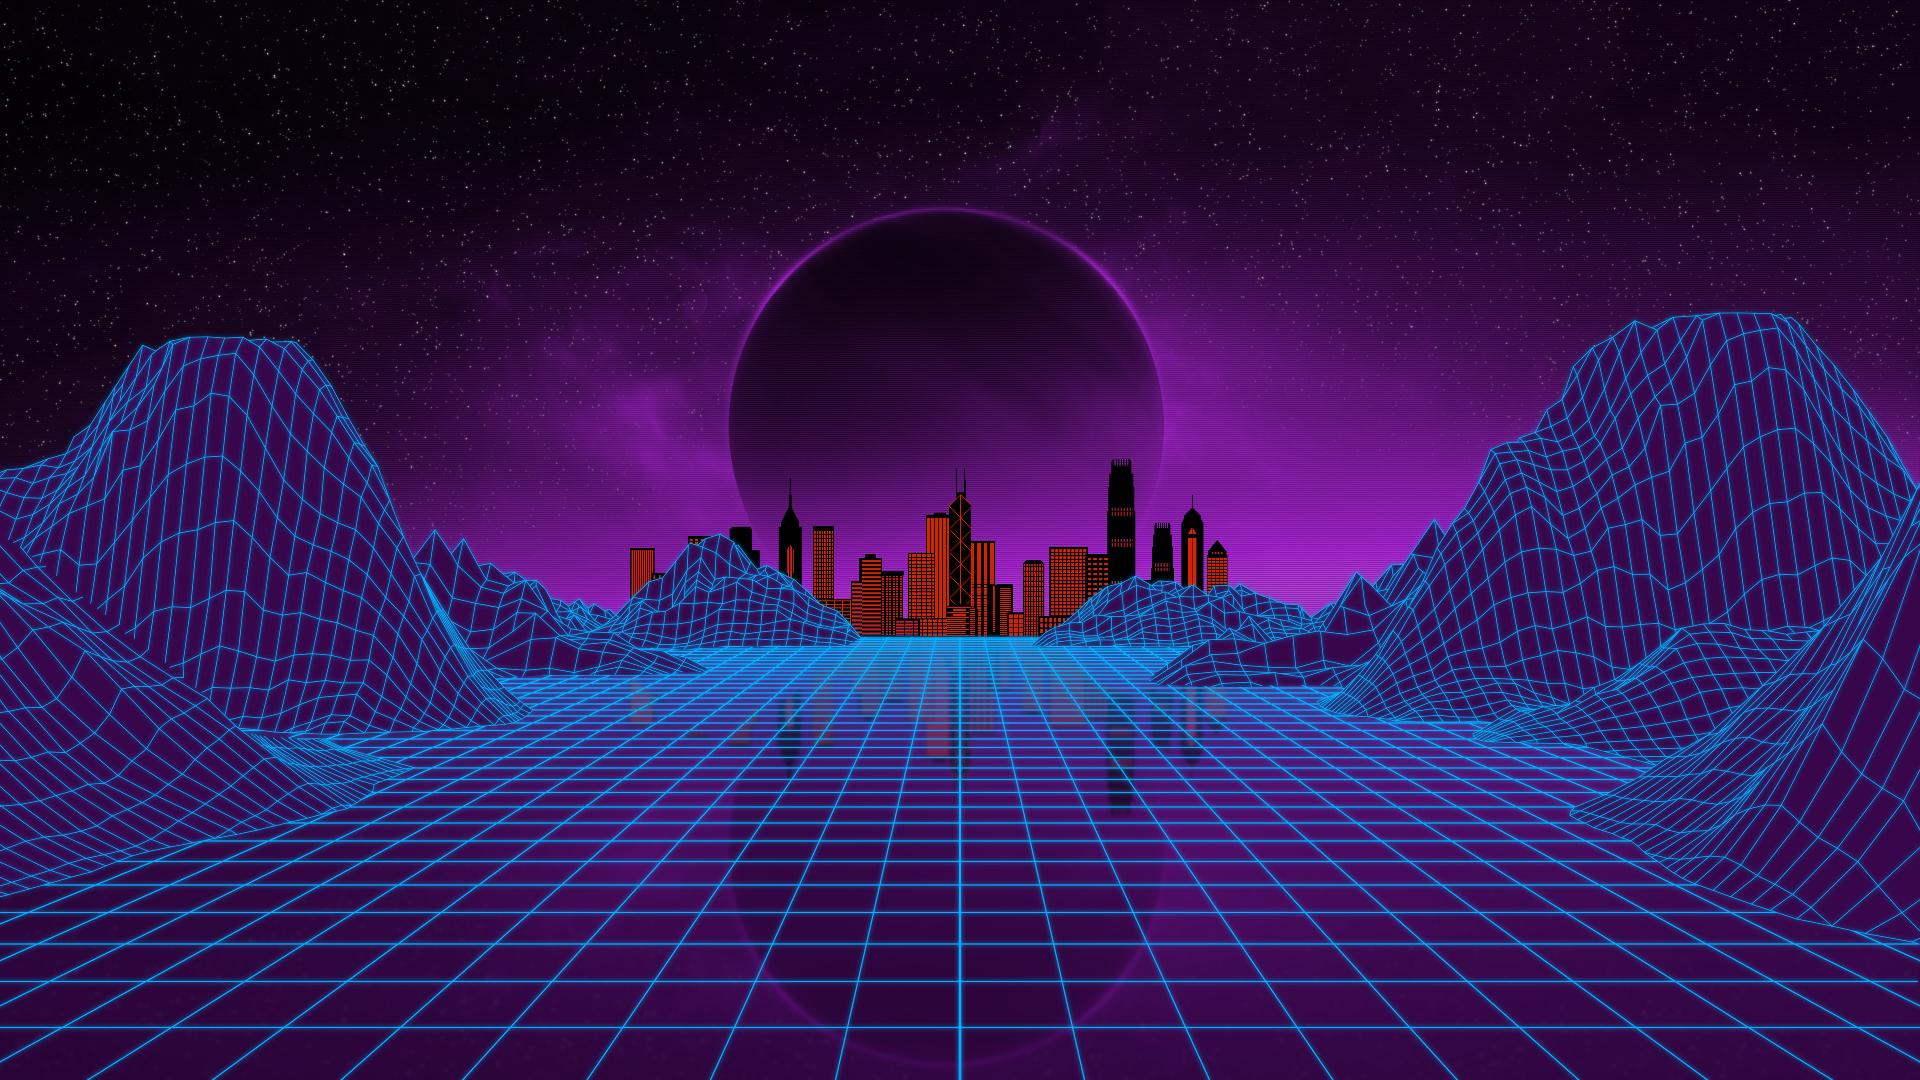 Details • Metaverse Lab • Hackaday.io 80s/90s VR